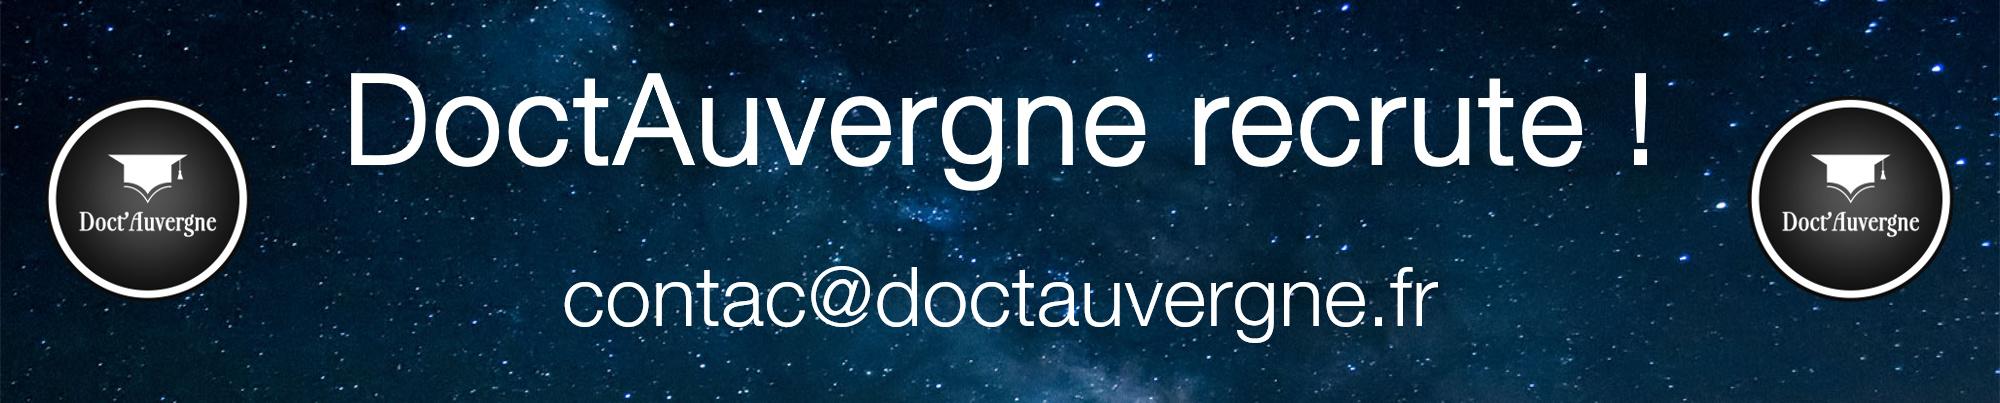 Doct'Auvergne recrute ! contact@doctauvergne.fr